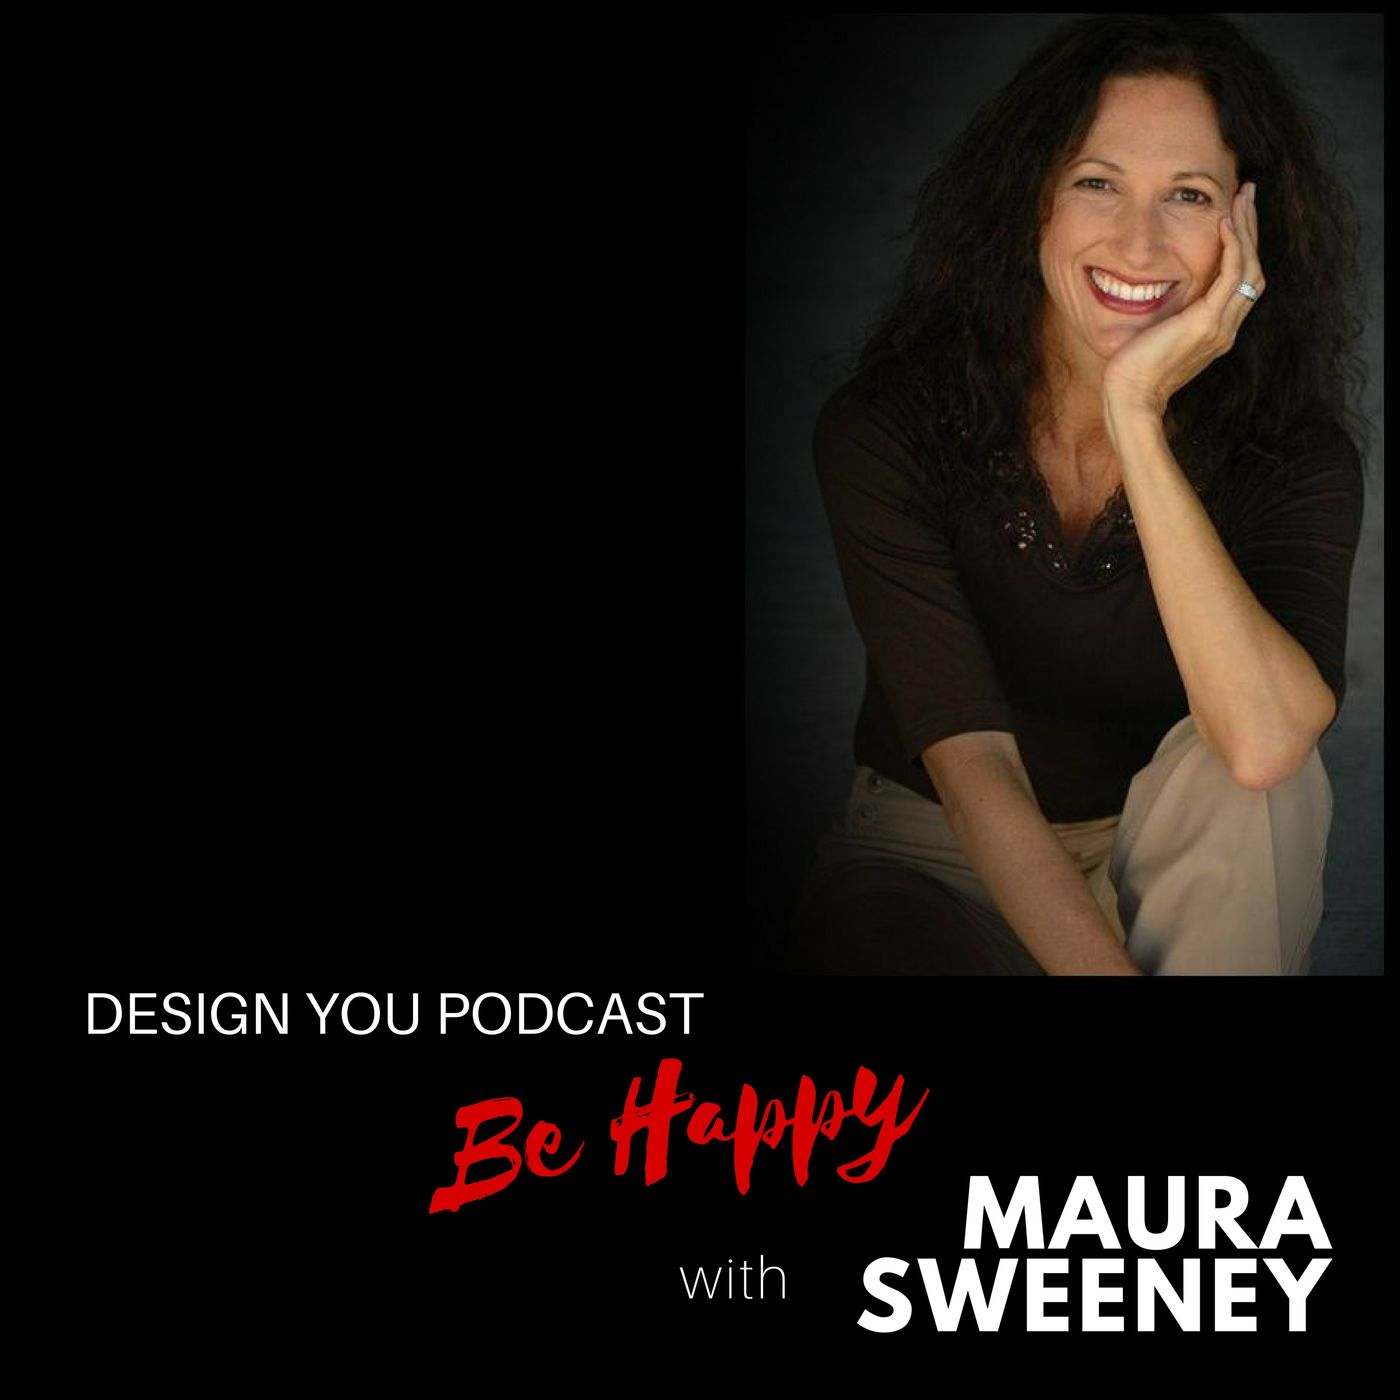 EP 0041 – Be Happy with Maura Sweeney